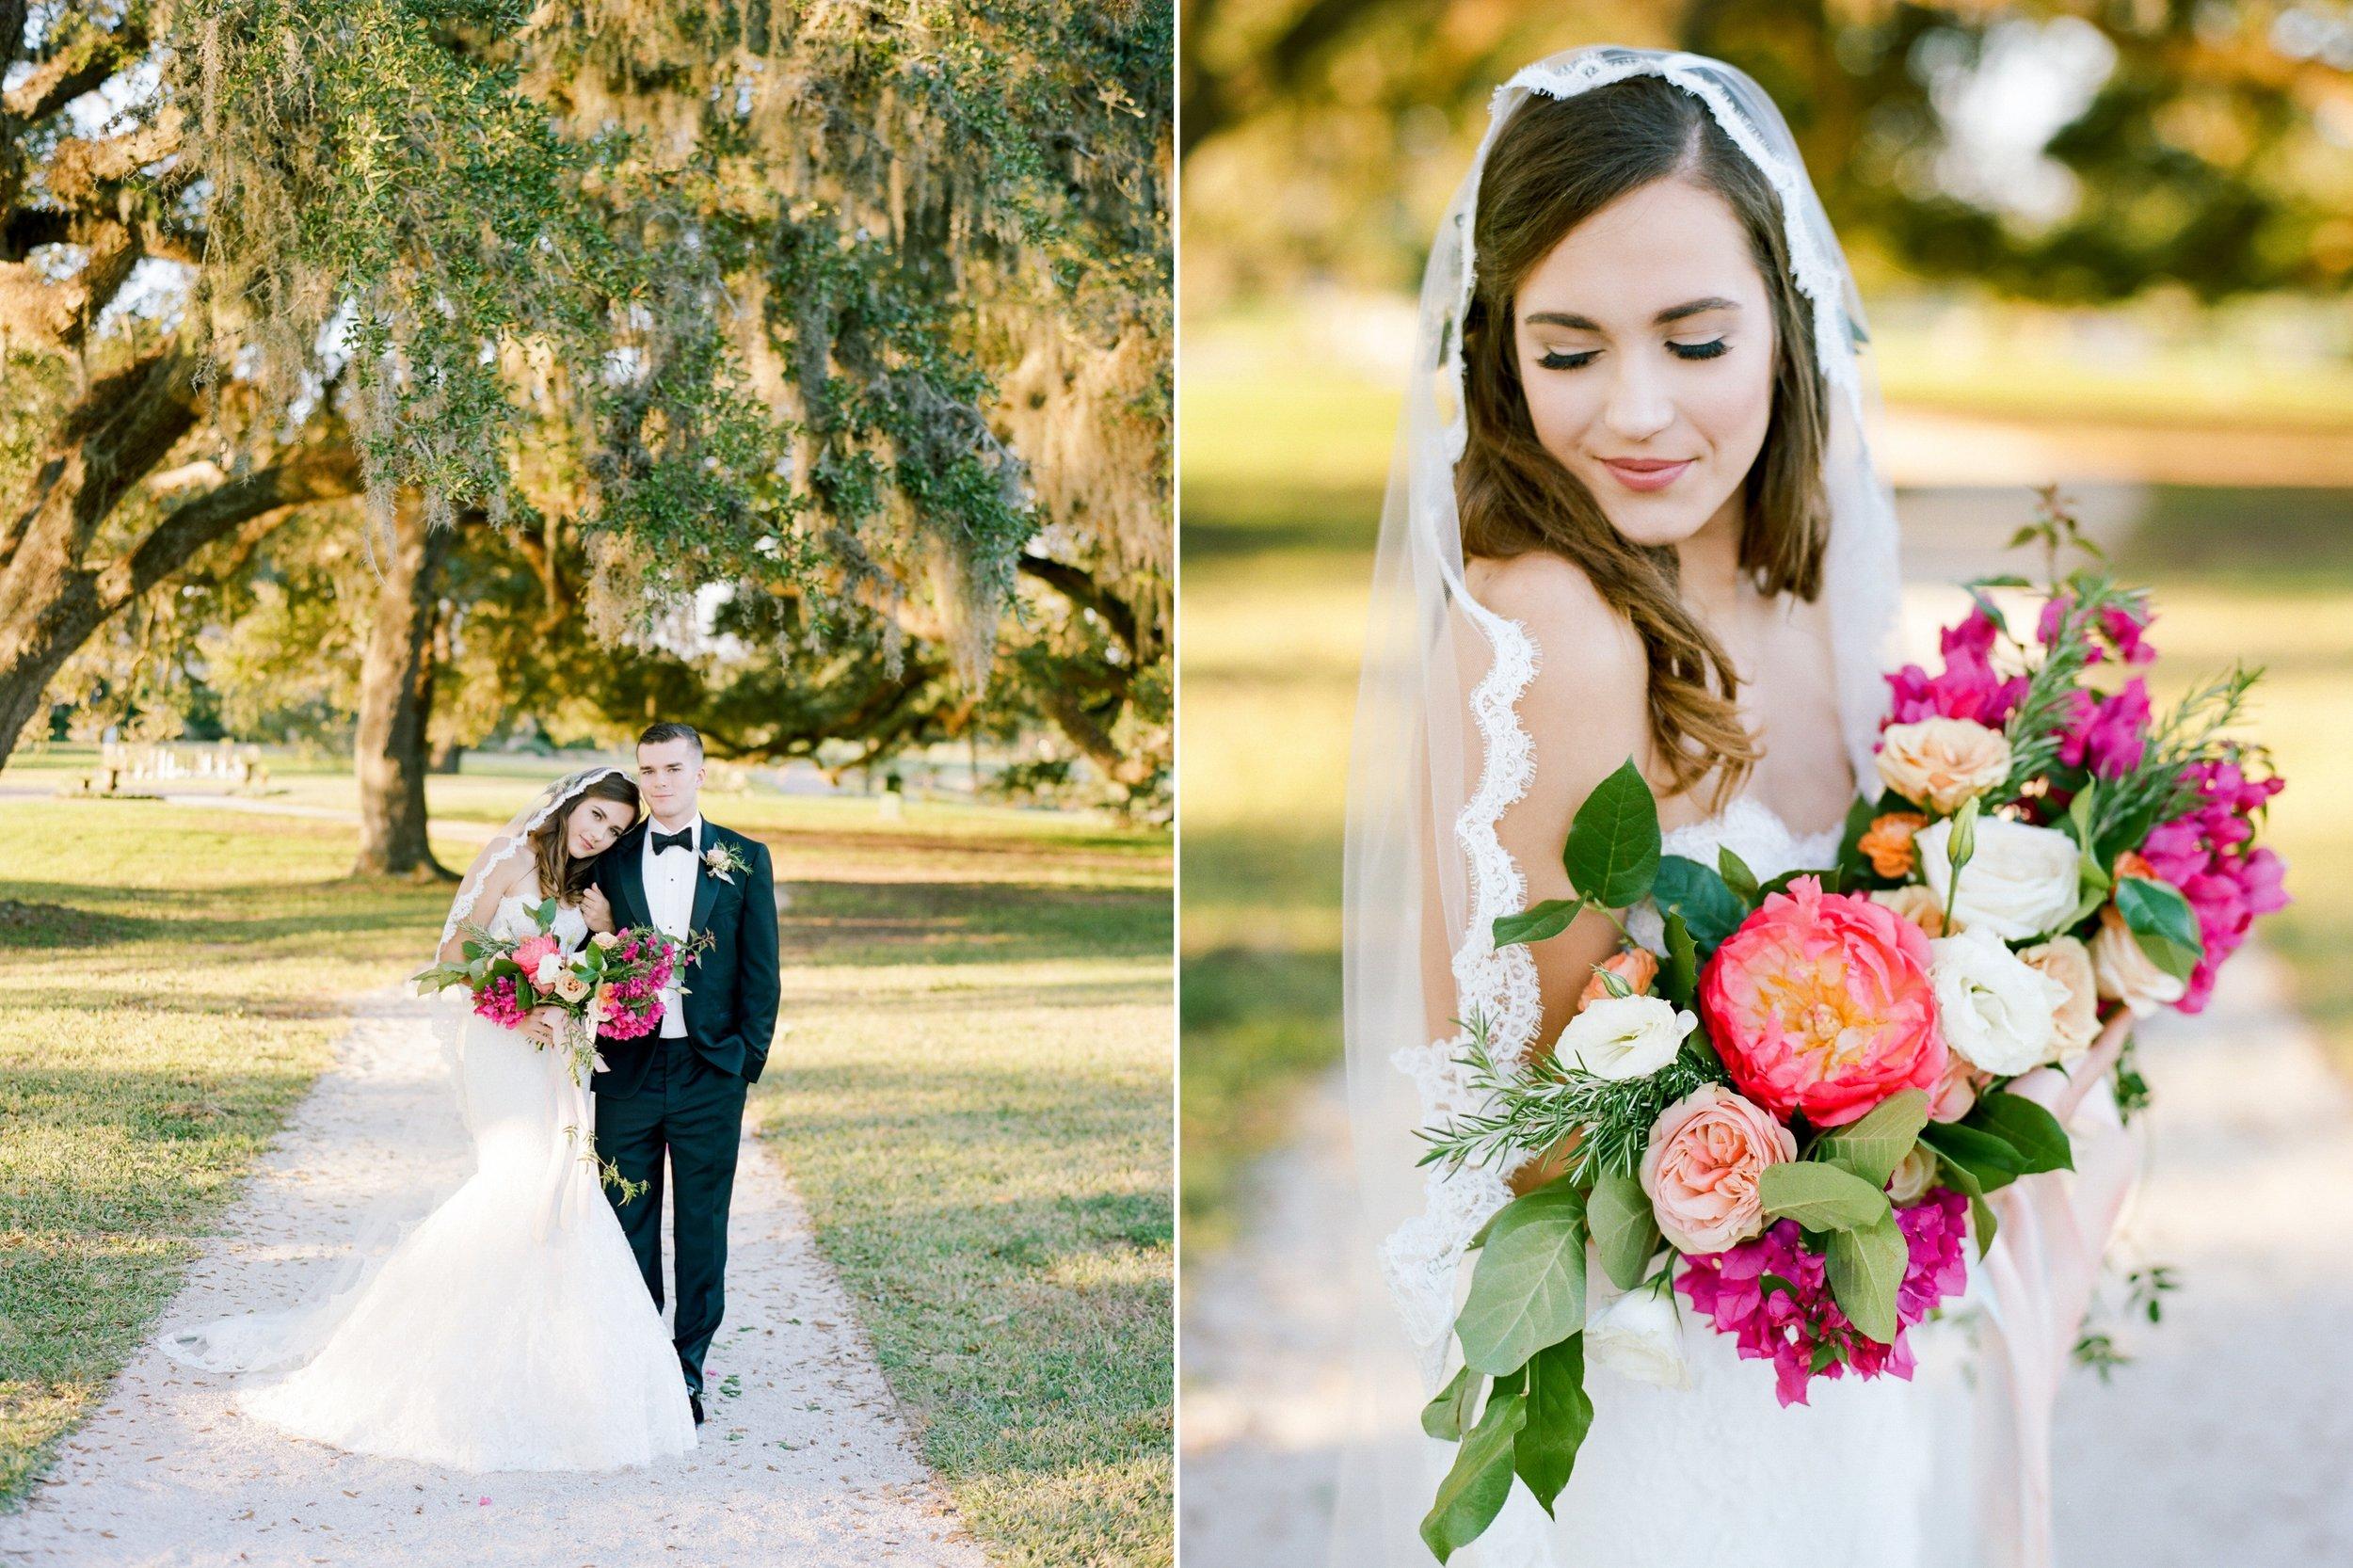 the-clubs-at-houston-oaks-wedding-houston-oaks-wedding-ceremony-houston-oaks-chapel-belle-of-the-ball-dana-fernandez-photography-houston-wedding-photographer-luxury-film-fine-art-105.jpg